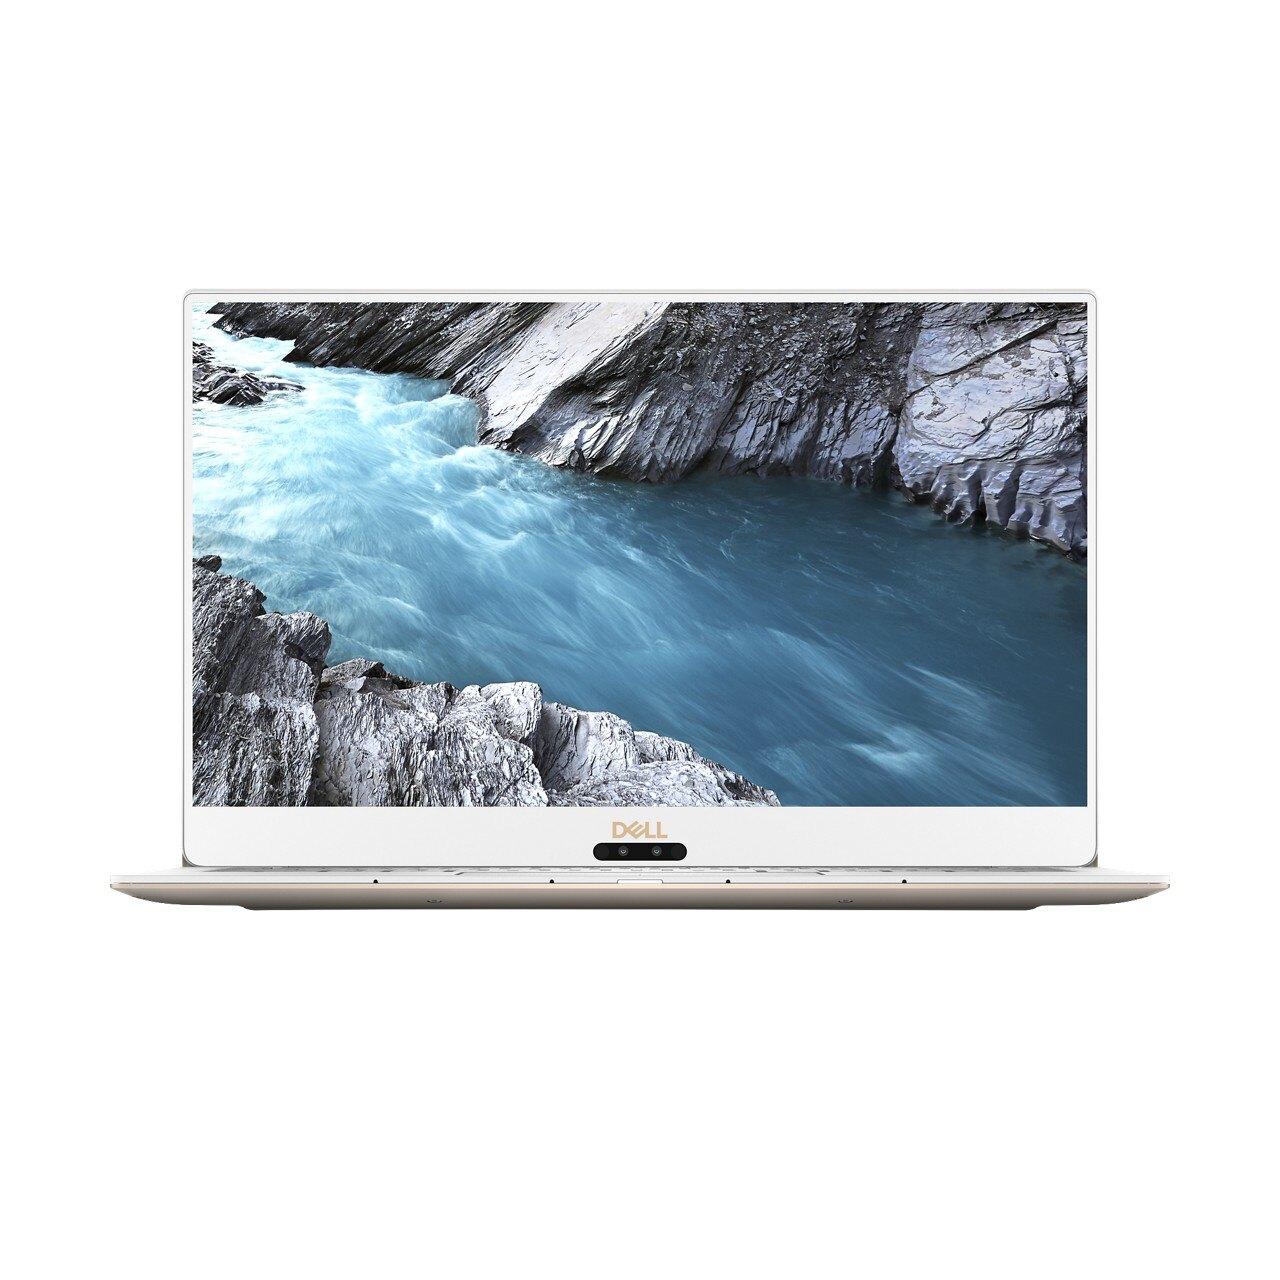 "Dell XPS 13 9370 Laptop: Intel Core I7-8550U, 13"" 1080p, 16GB DDR3, 512GB SSD, Win 10 $919.99 AC + Free Shipping @ Rakuten"